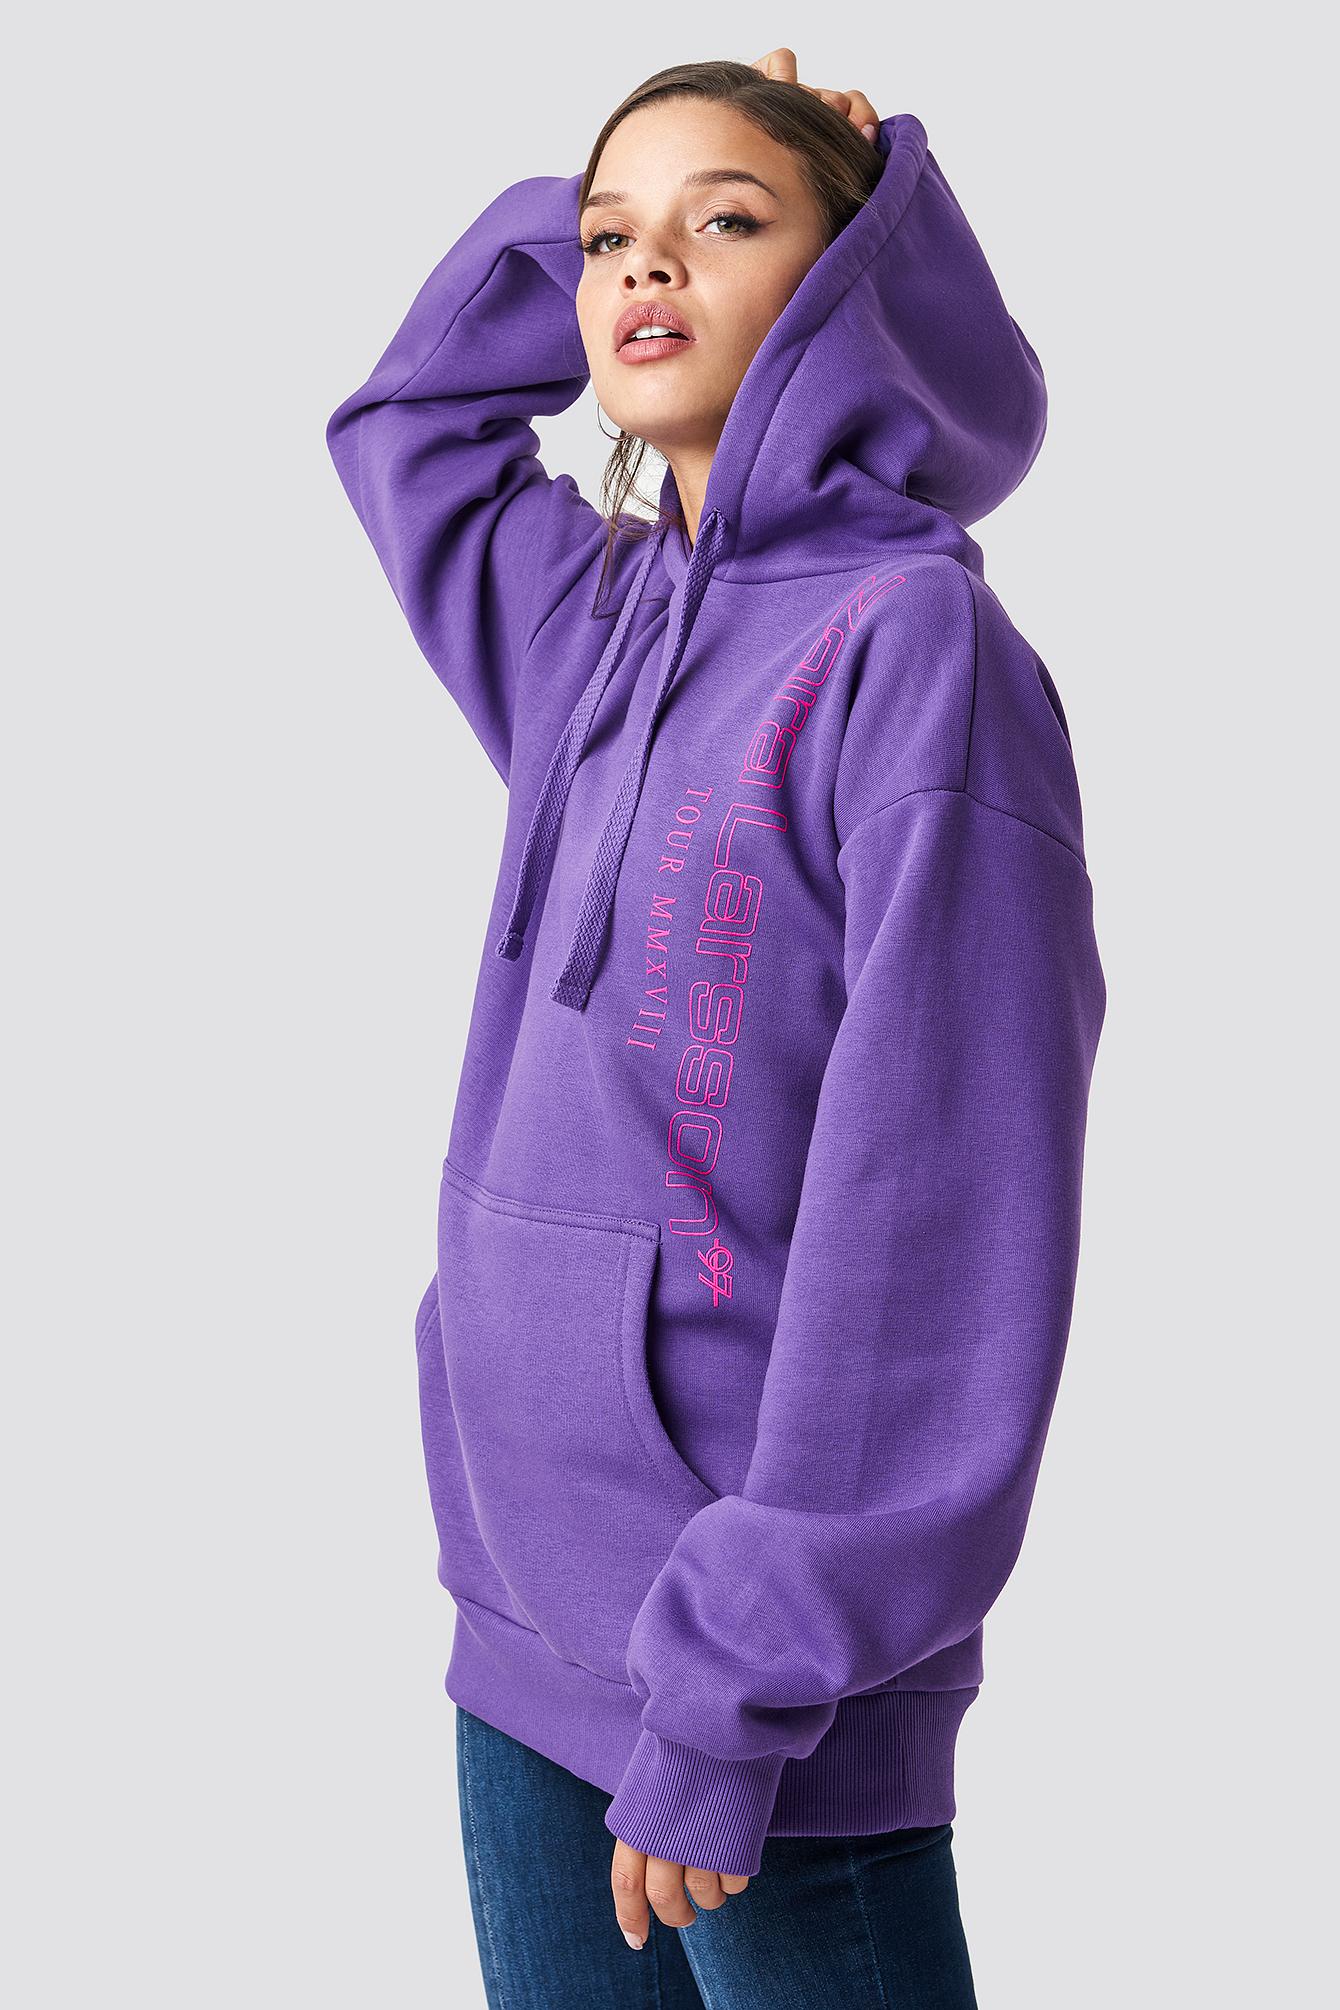 zara larsson -  Unisex Hoodie - Purple